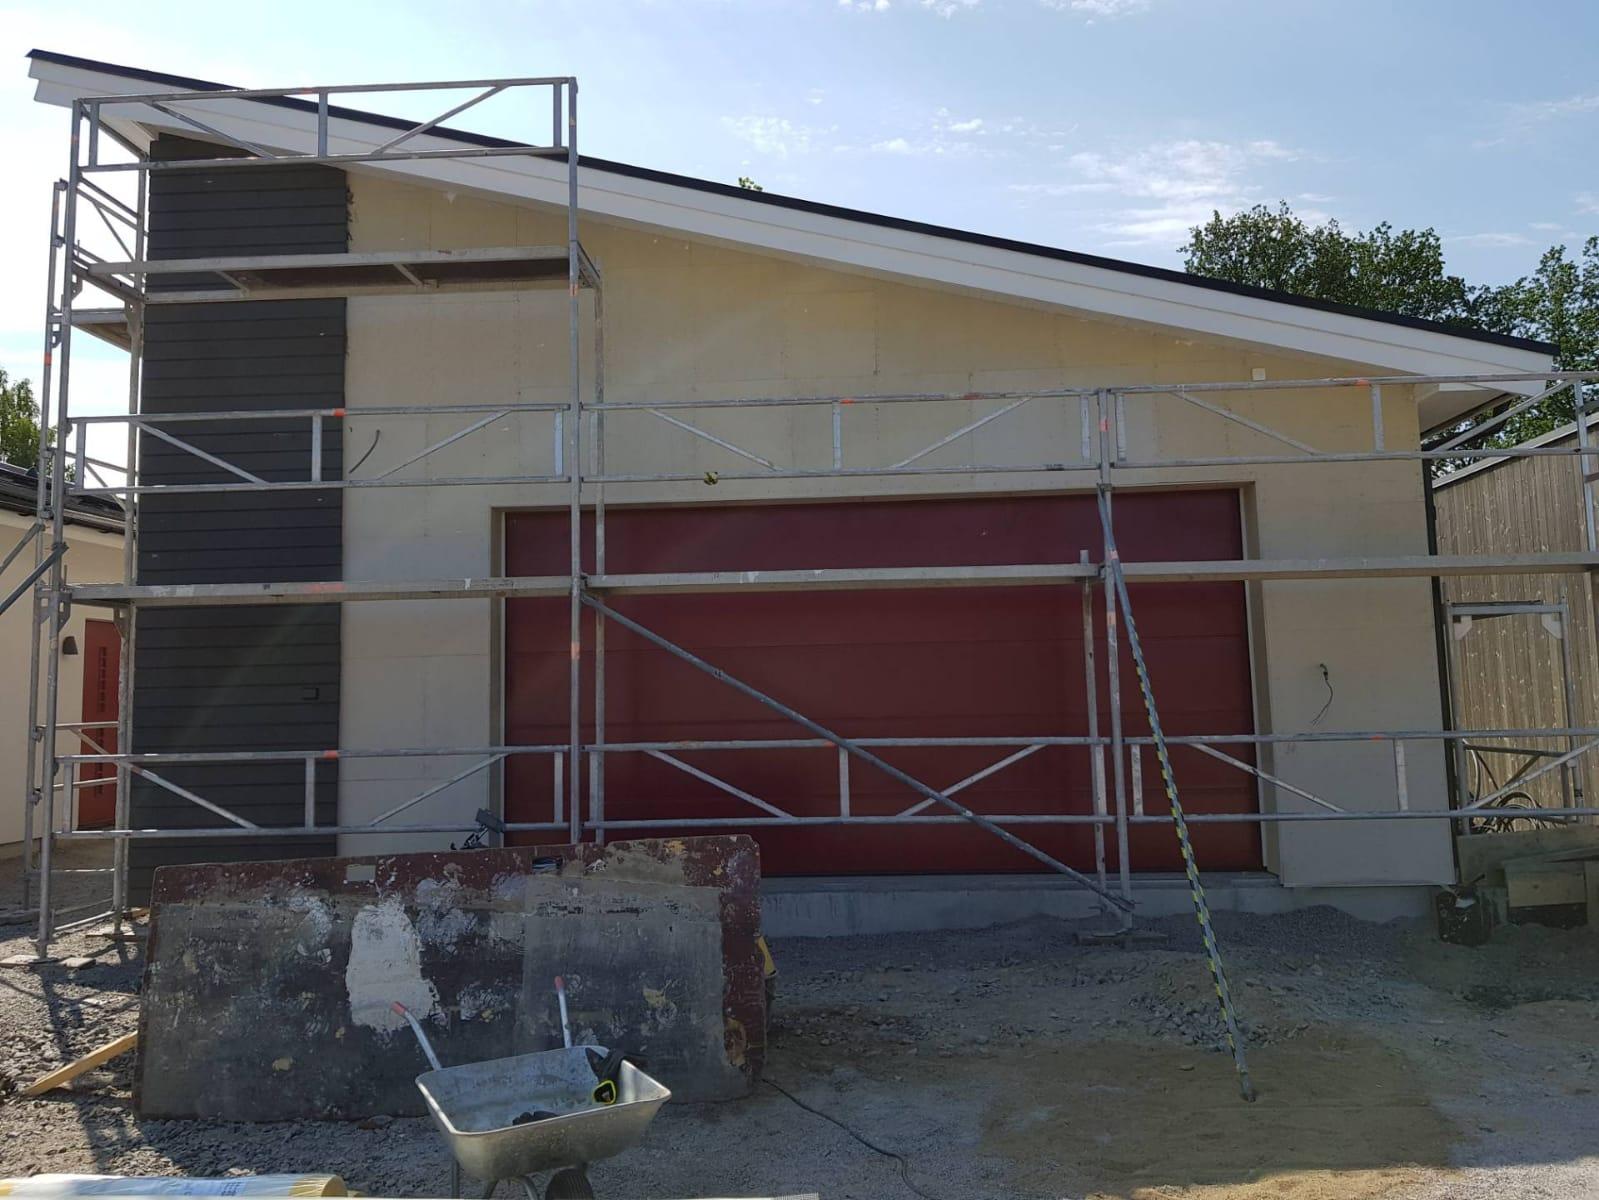 Fasadputsning av Blekinge fasad ab